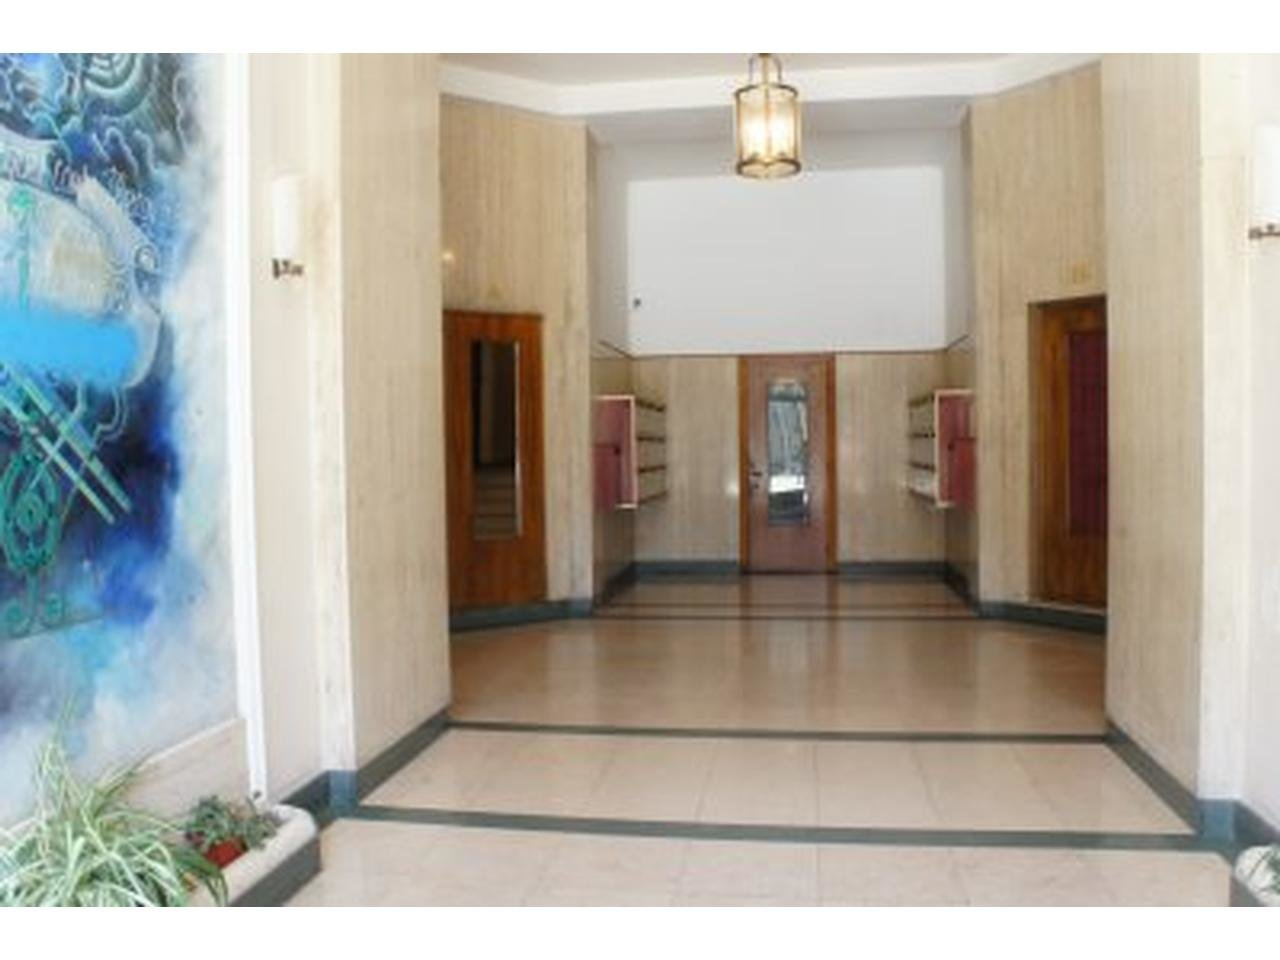 Sale Apartment - Nice Rue de France